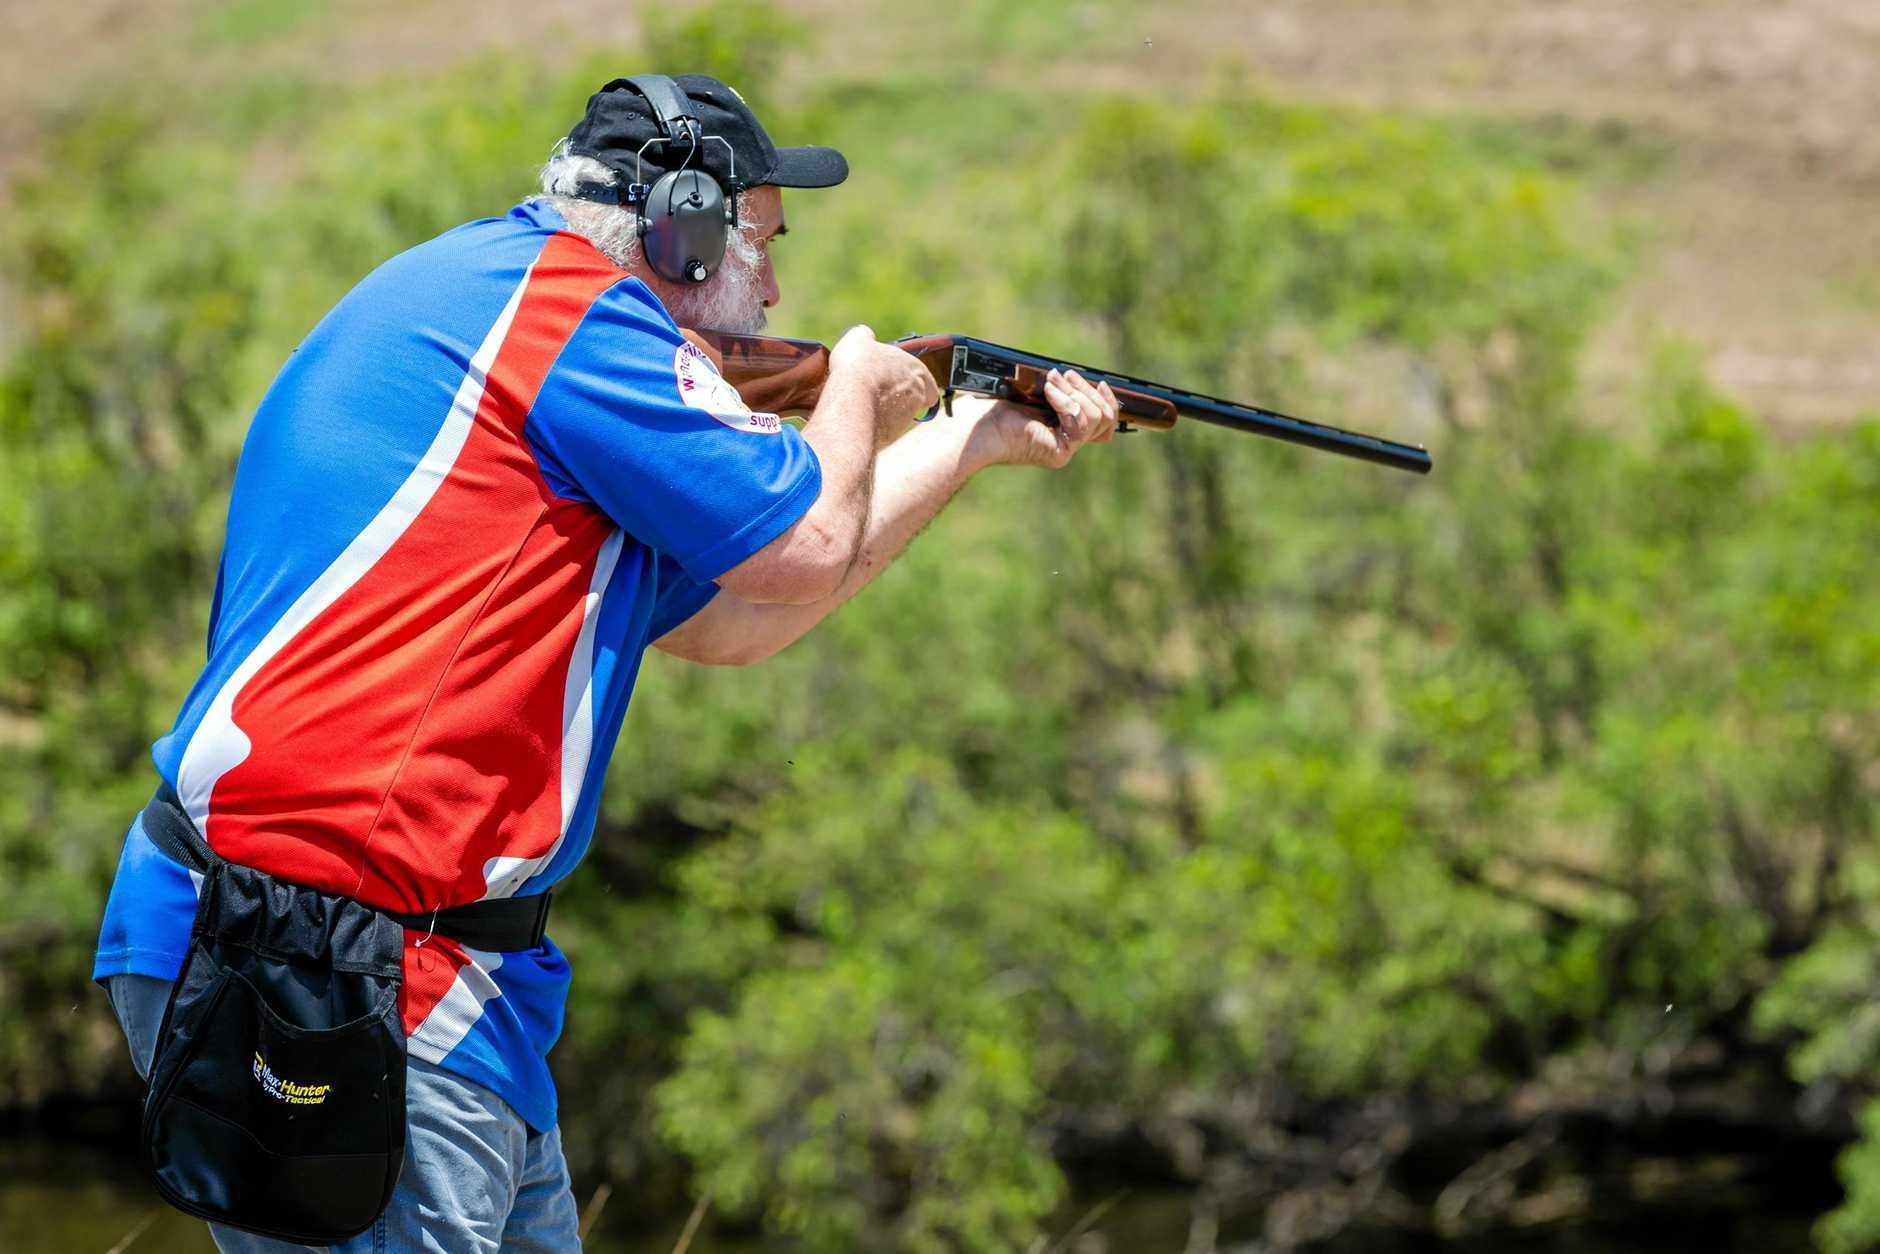 Shooting clays, Ron Owen